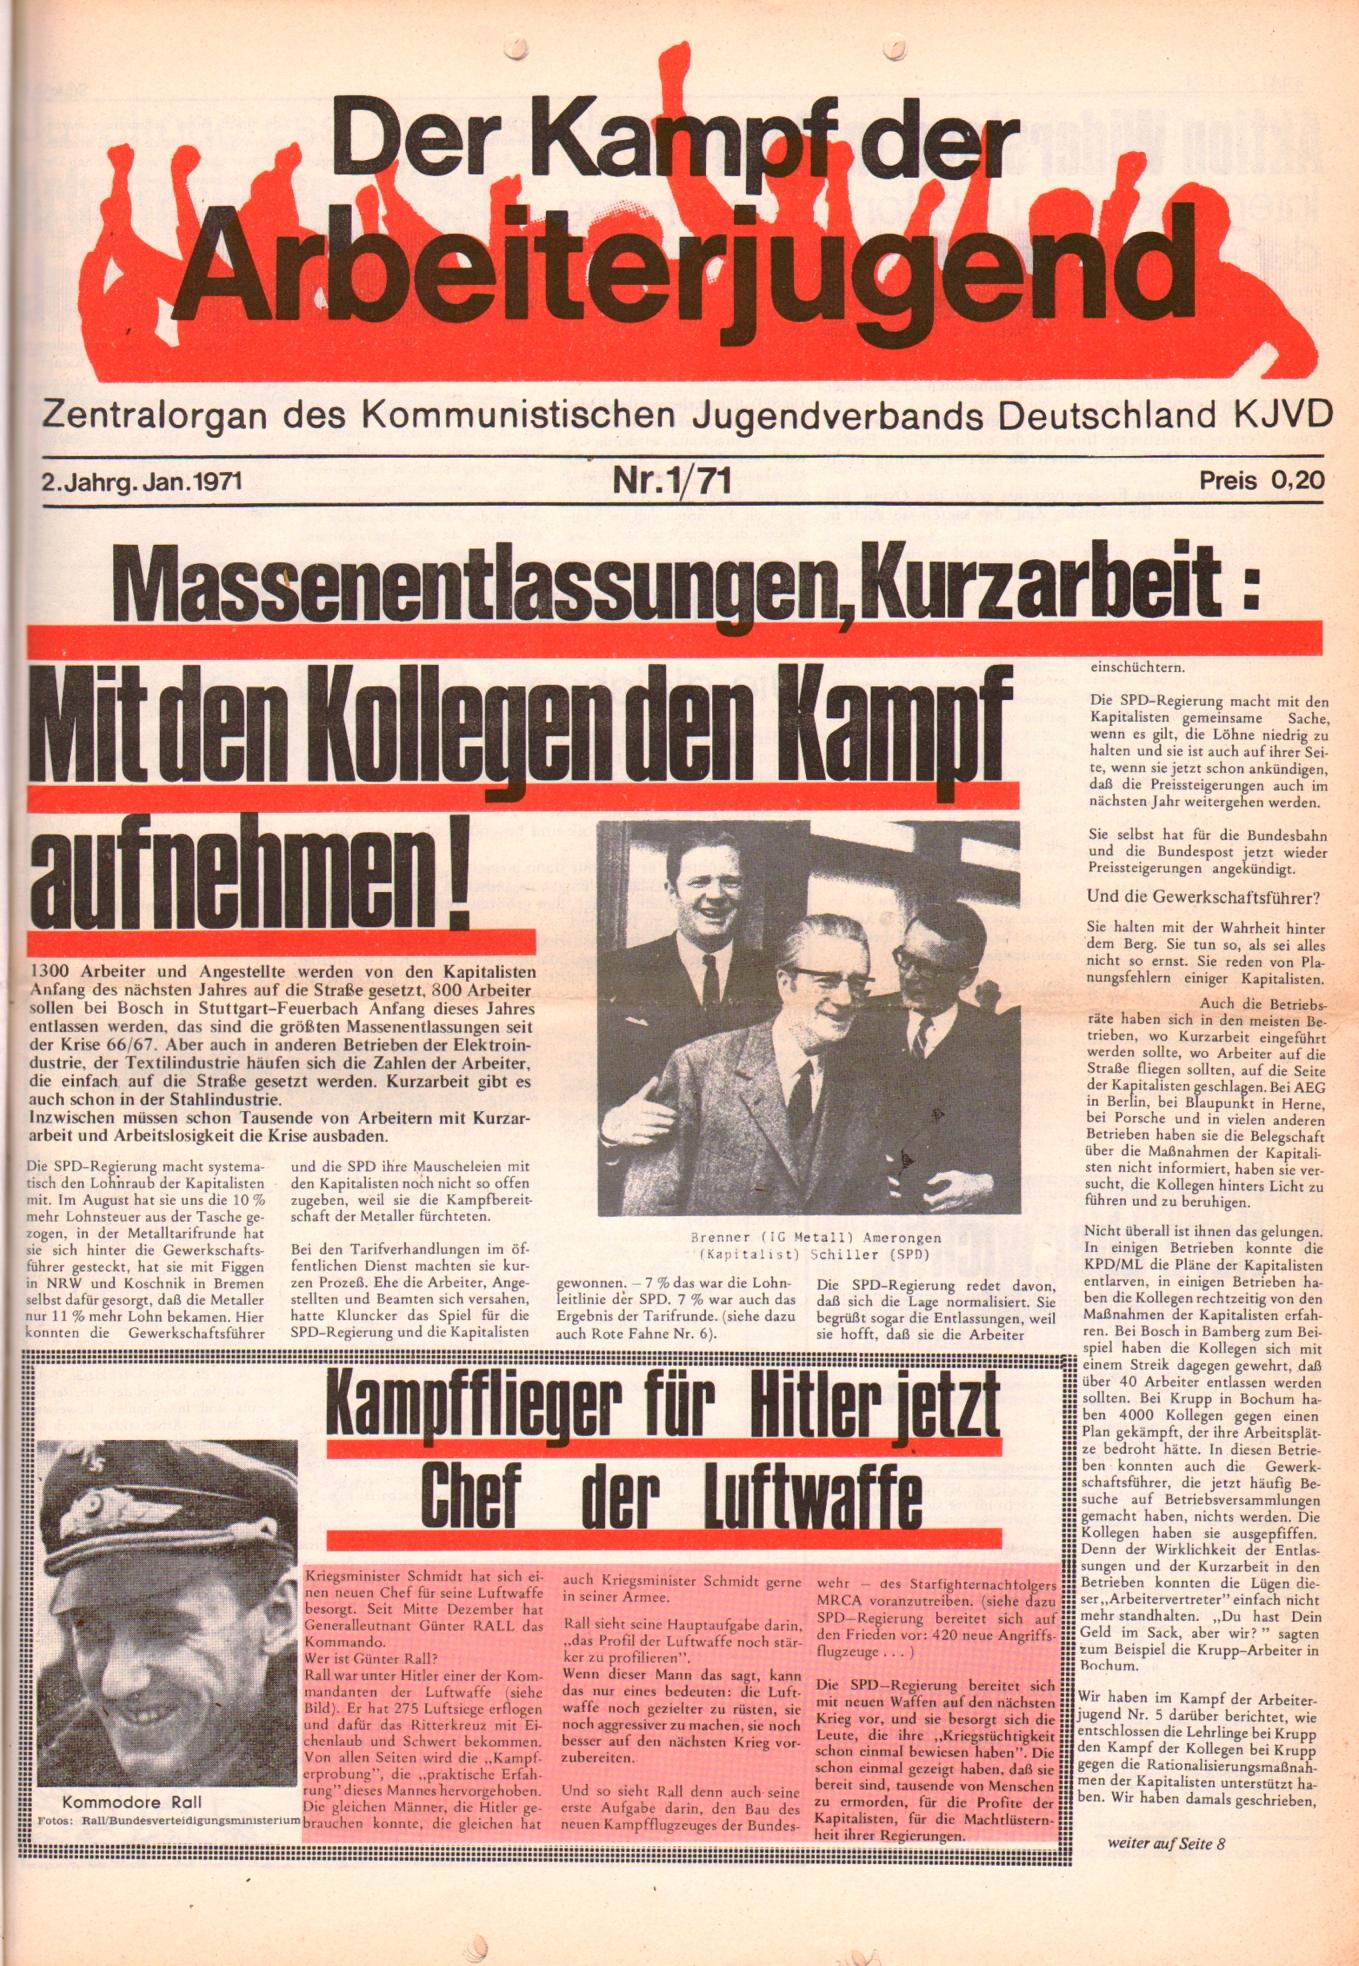 KDAJ, 2. Jg., Januar 1971, Nr. 1, Seite 1